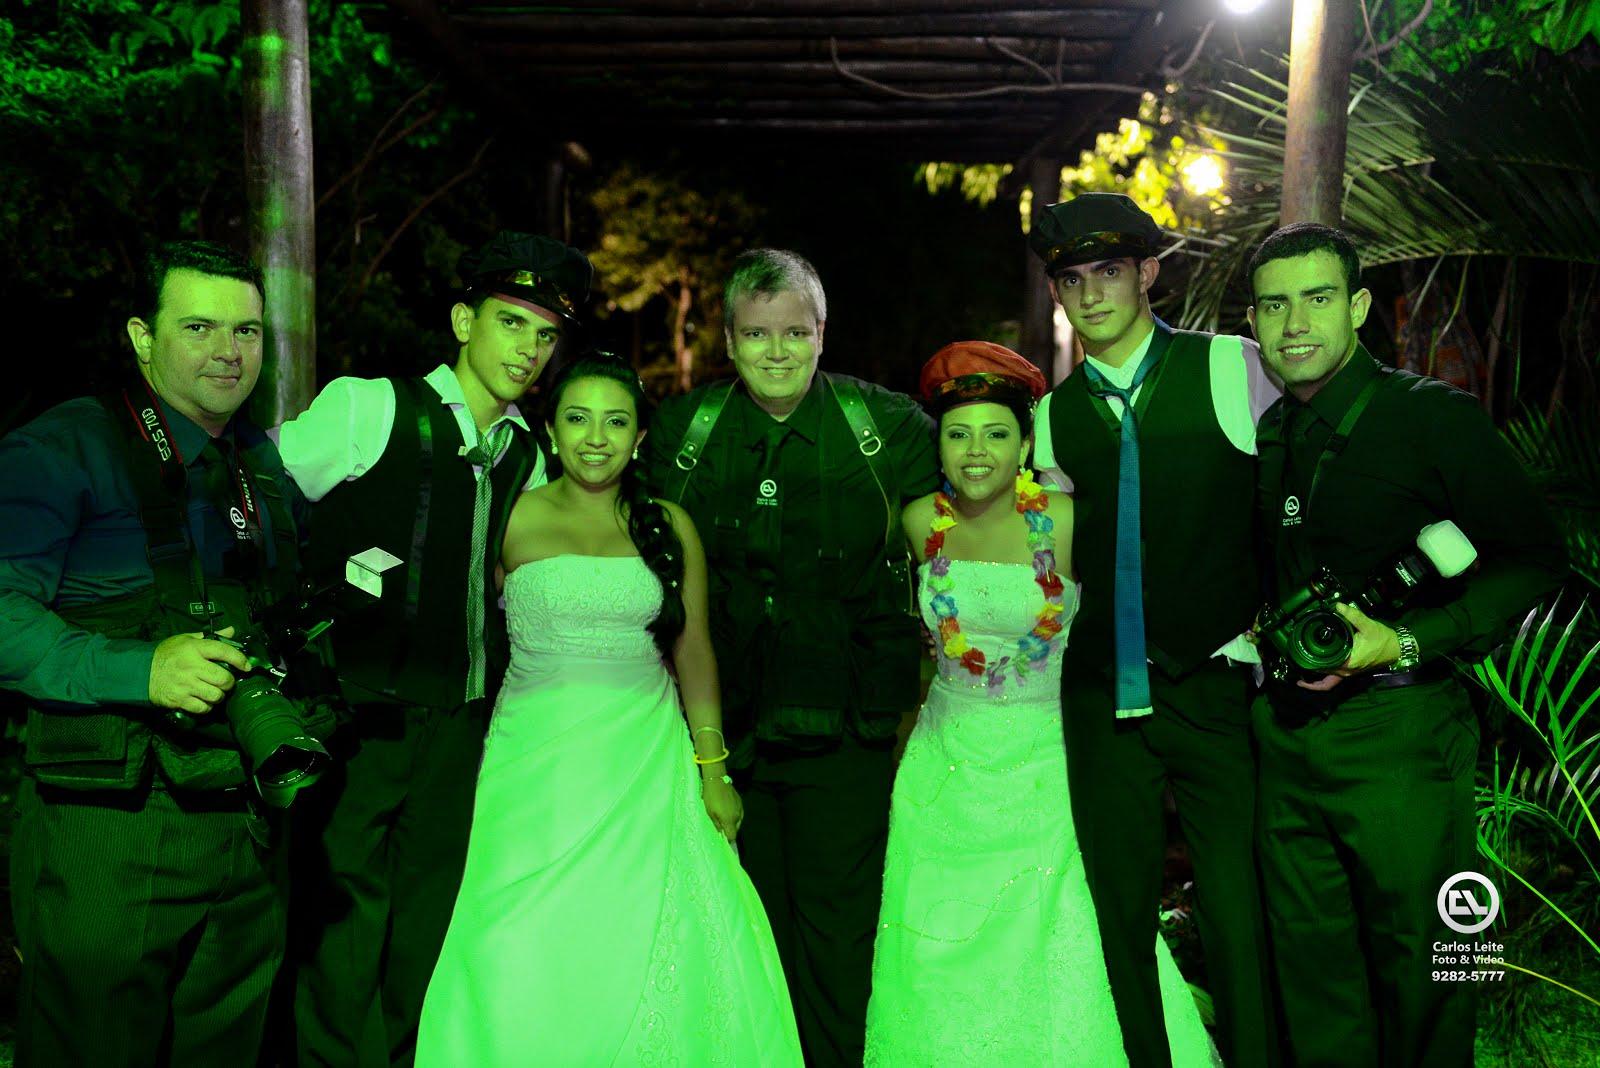 Fim de festa - Casamento duplo das irmãs Rafaela & Arthur e Renata & Genivaldo